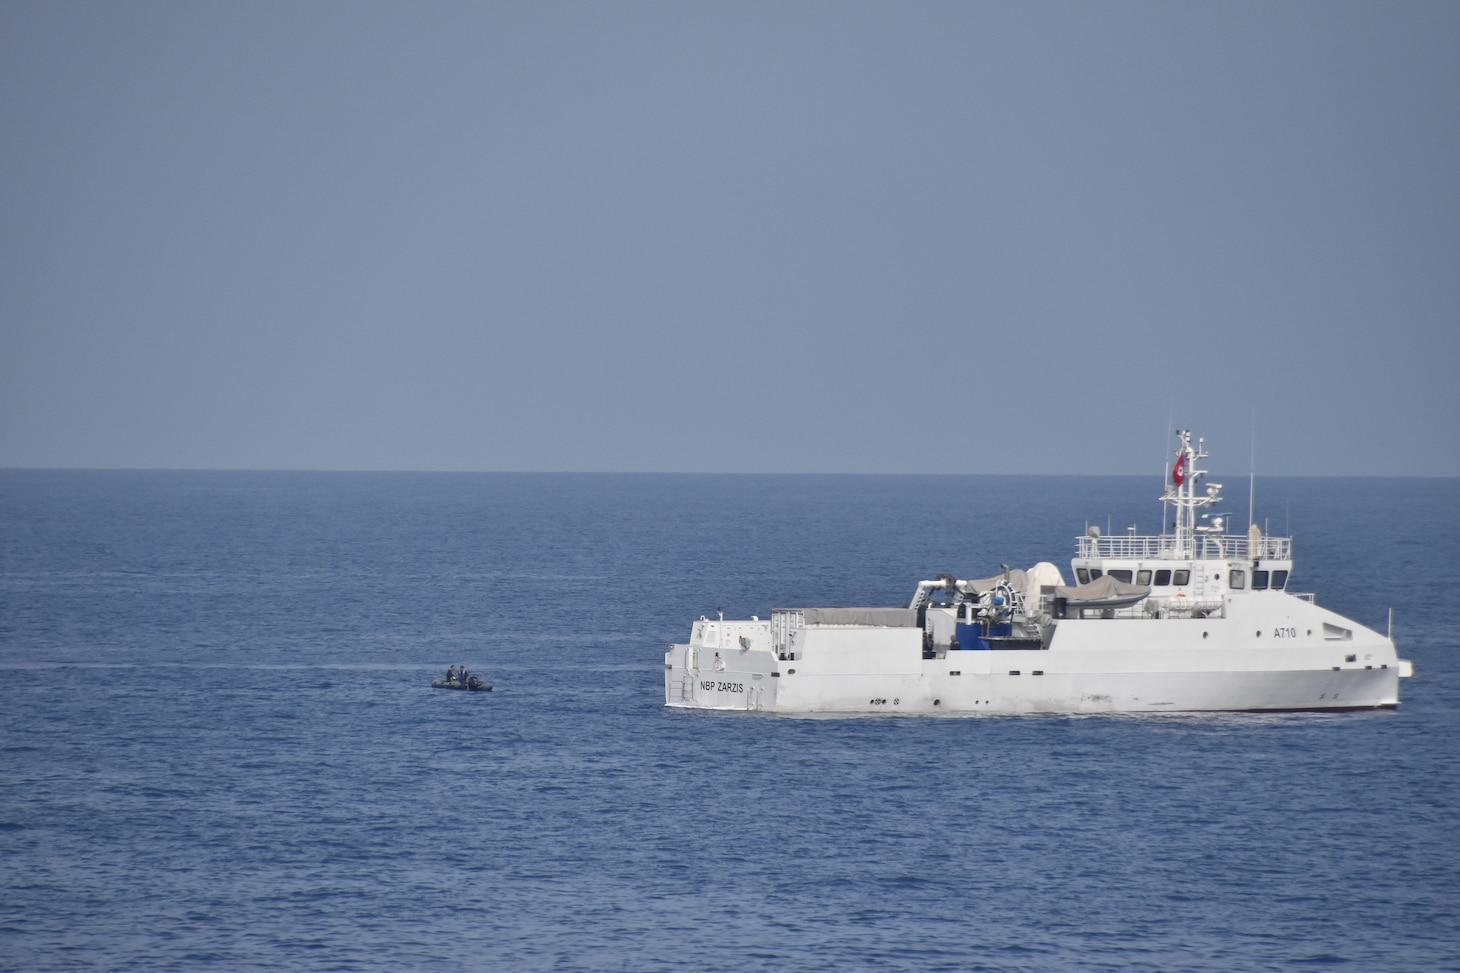 USNS Trenton Interoperability Exercise With Tunisia